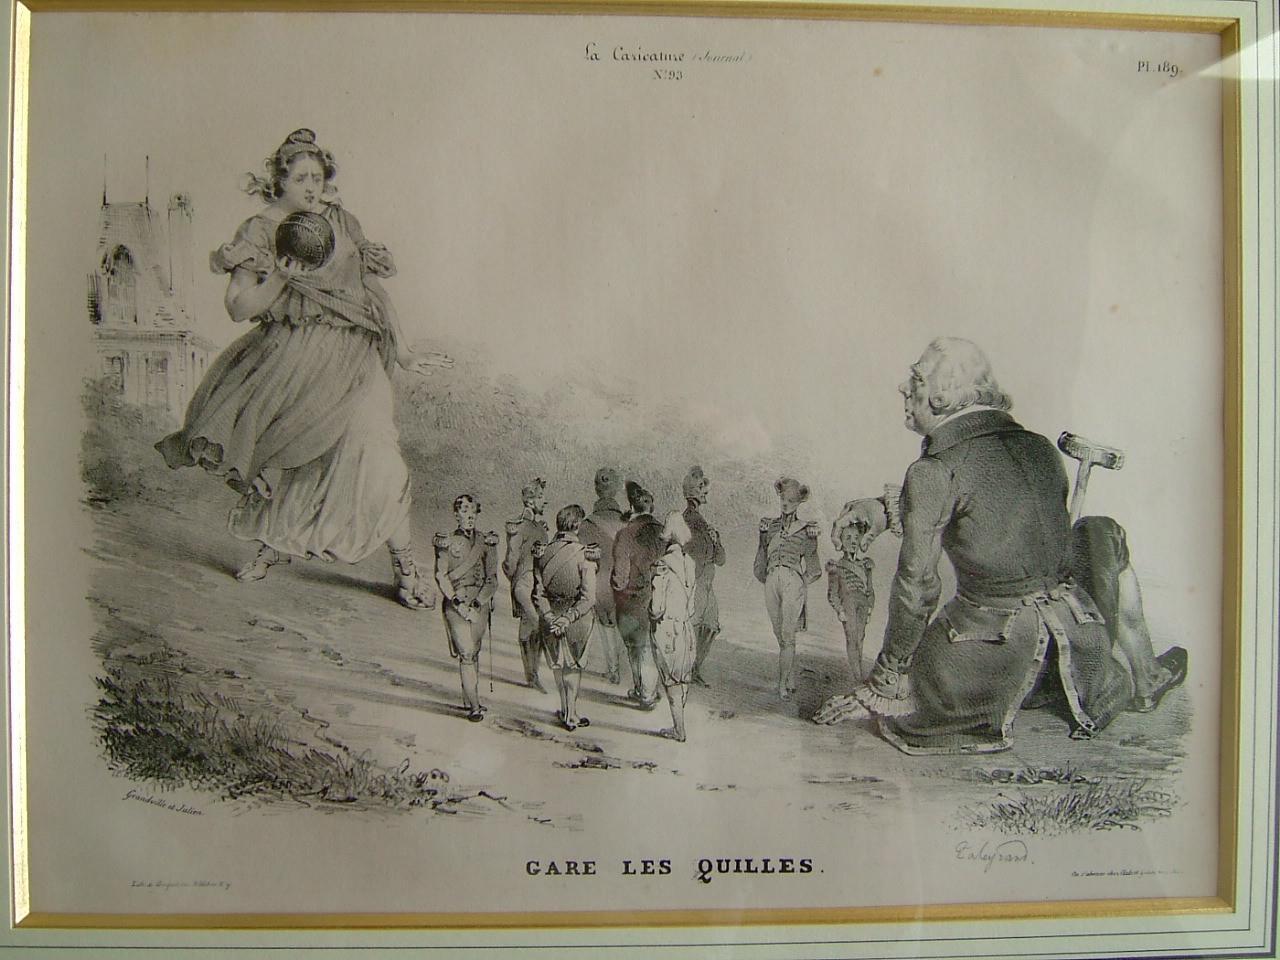 GRANDVILLE (dit), GERARD Jean Ignace Isidore (caricaturiste), JULIEN (lithographe) : Gare les quilles